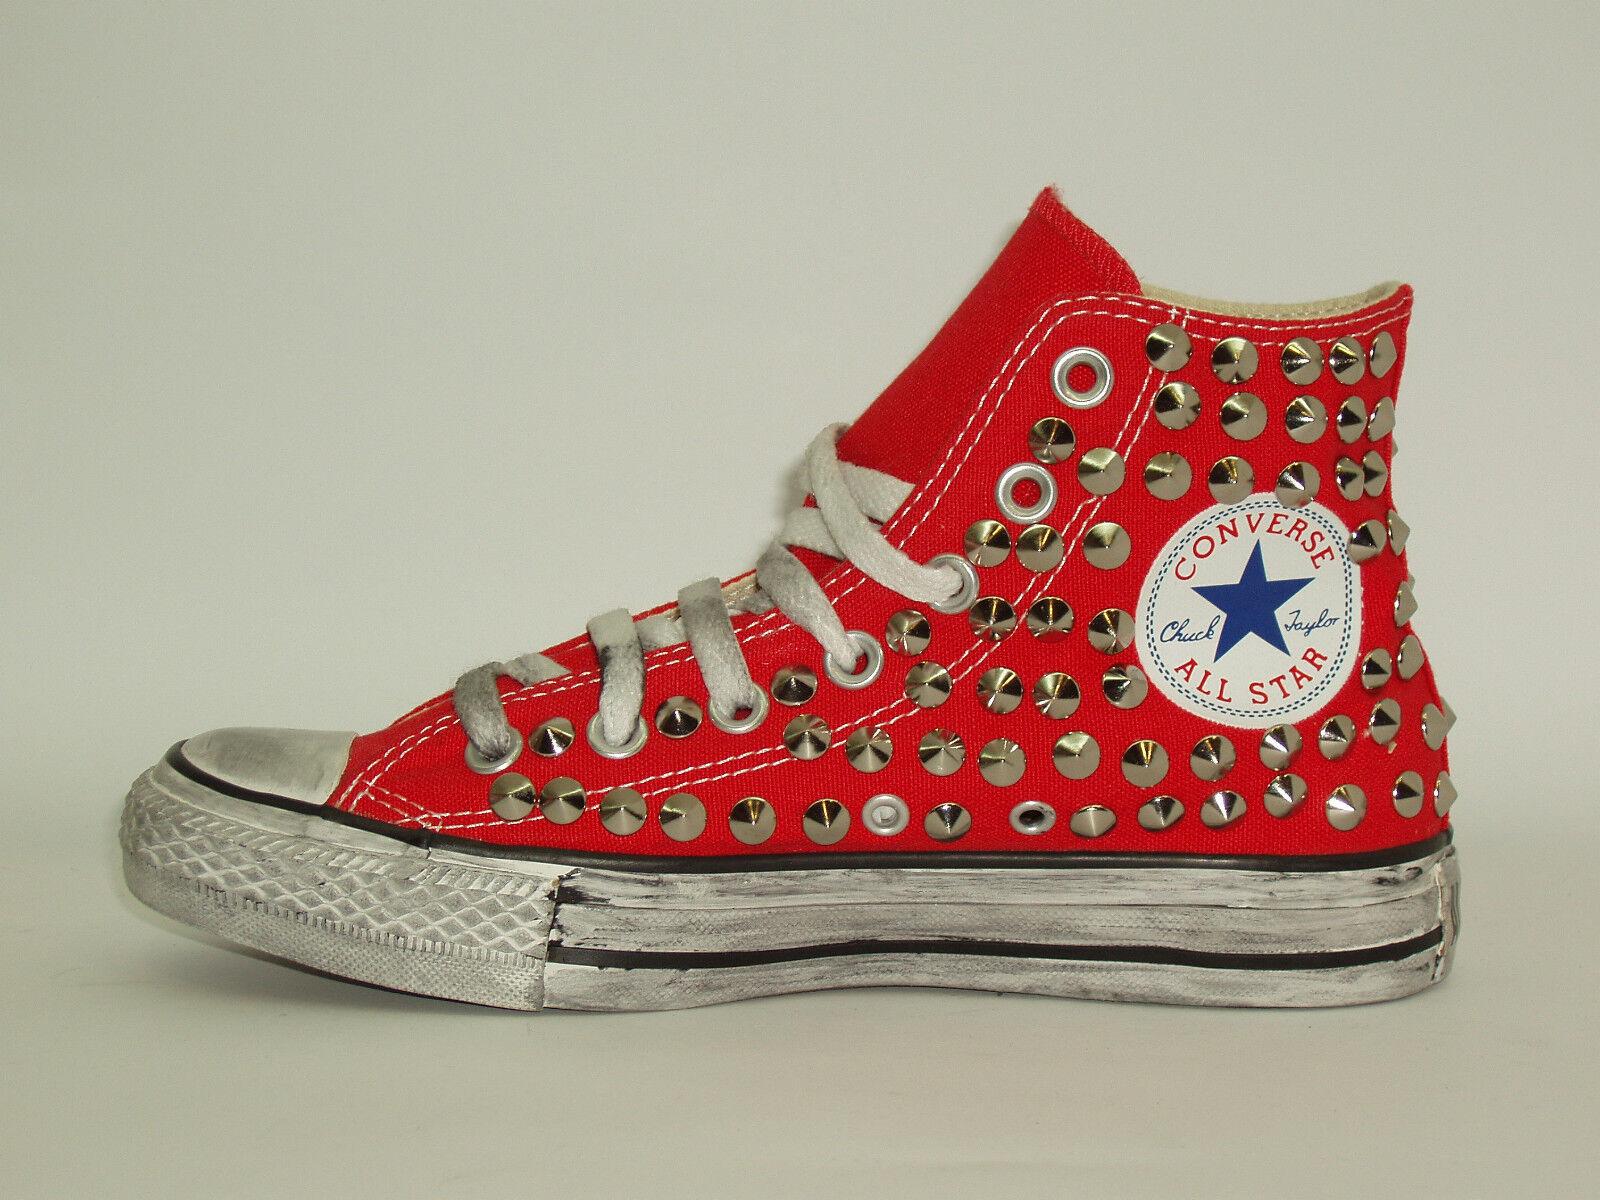 Converse all star Hi rosso,nero,grigio,blu borchie scarpe donna uomo rosso,nero,grigio,blu Hi artigianali b88ac3